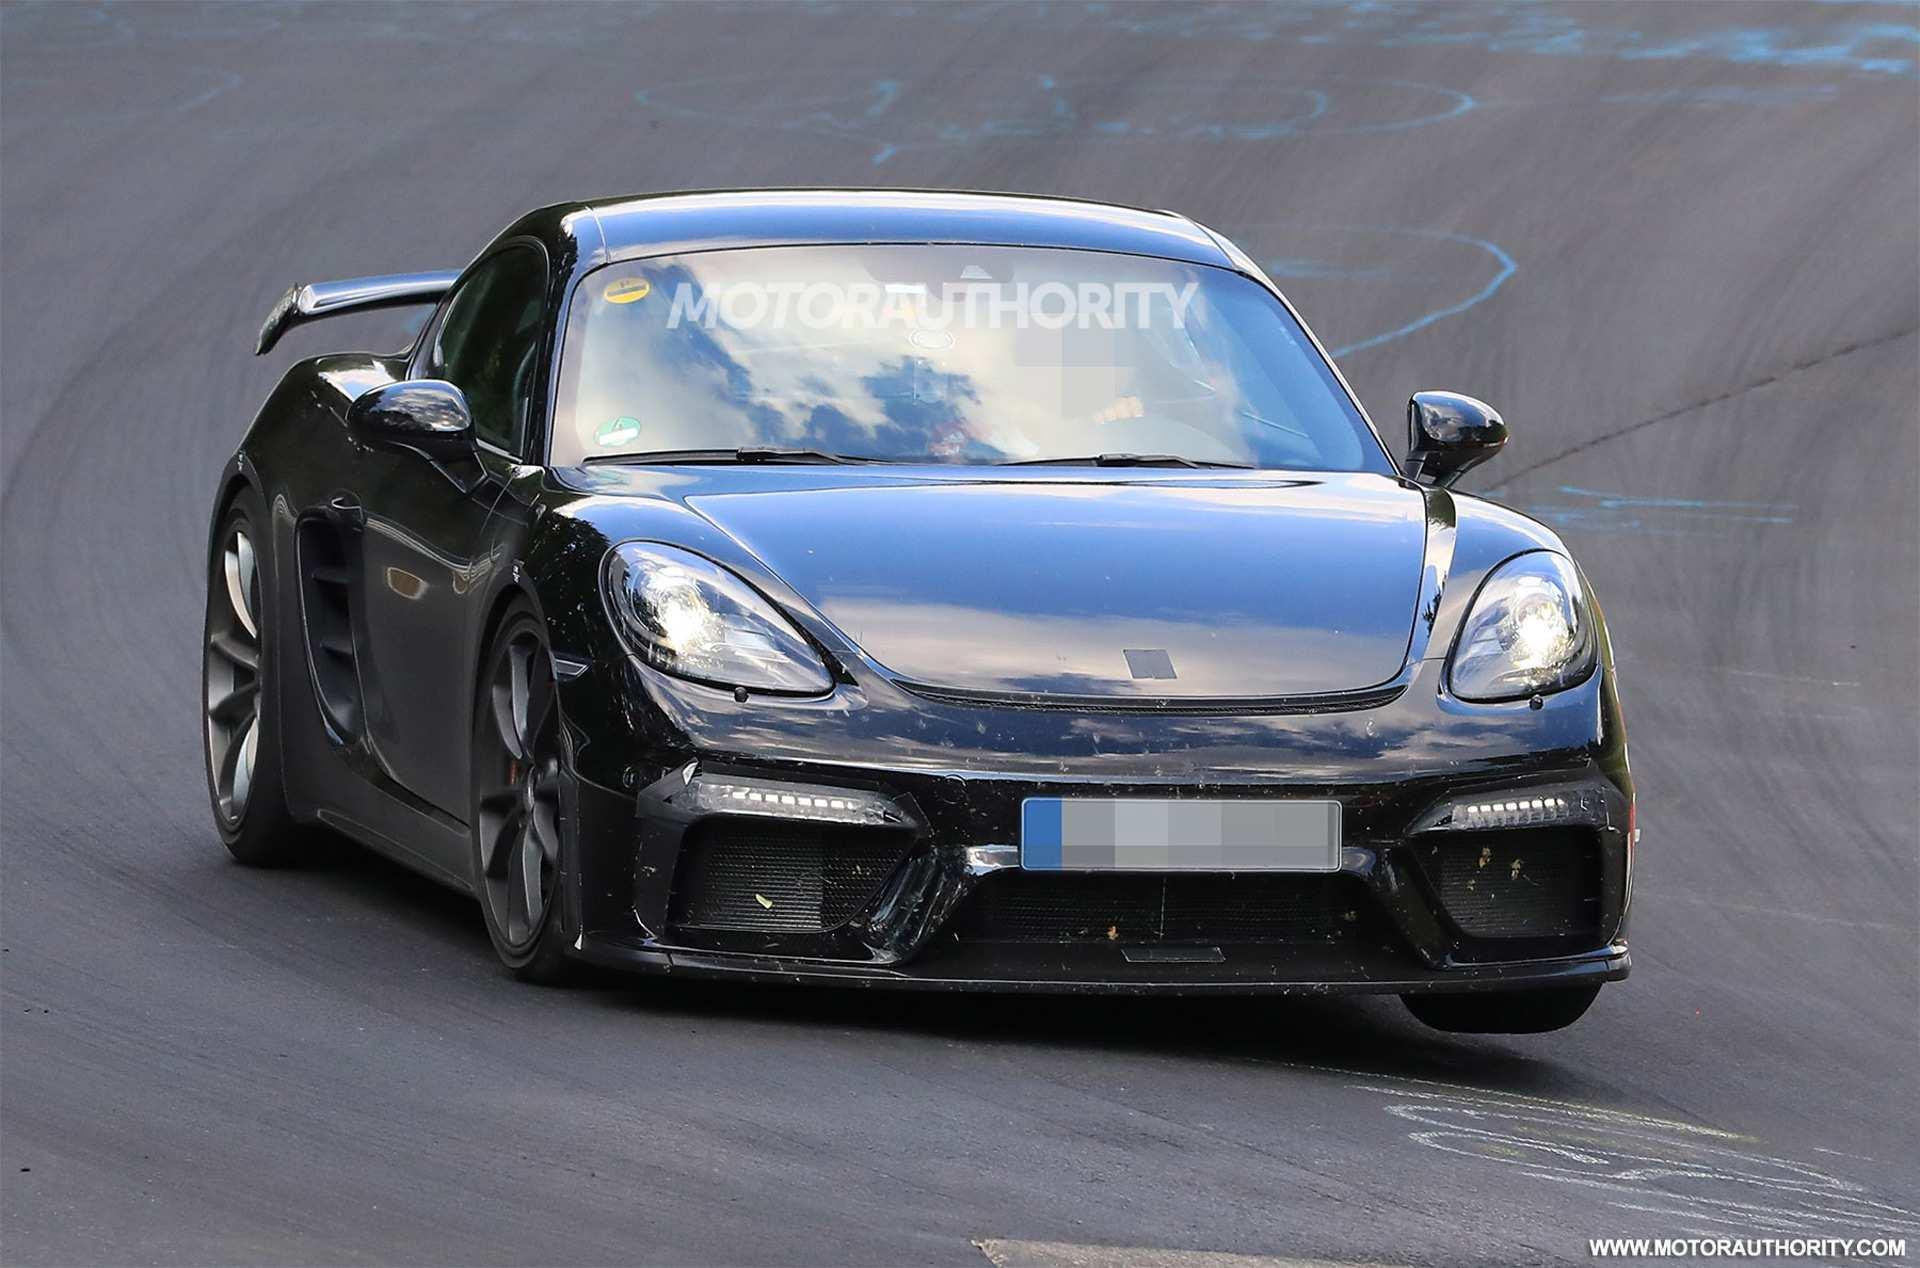 60 Concept of 2020 Porsche 718 Cayman Research New with 2020 Porsche 718 Cayman